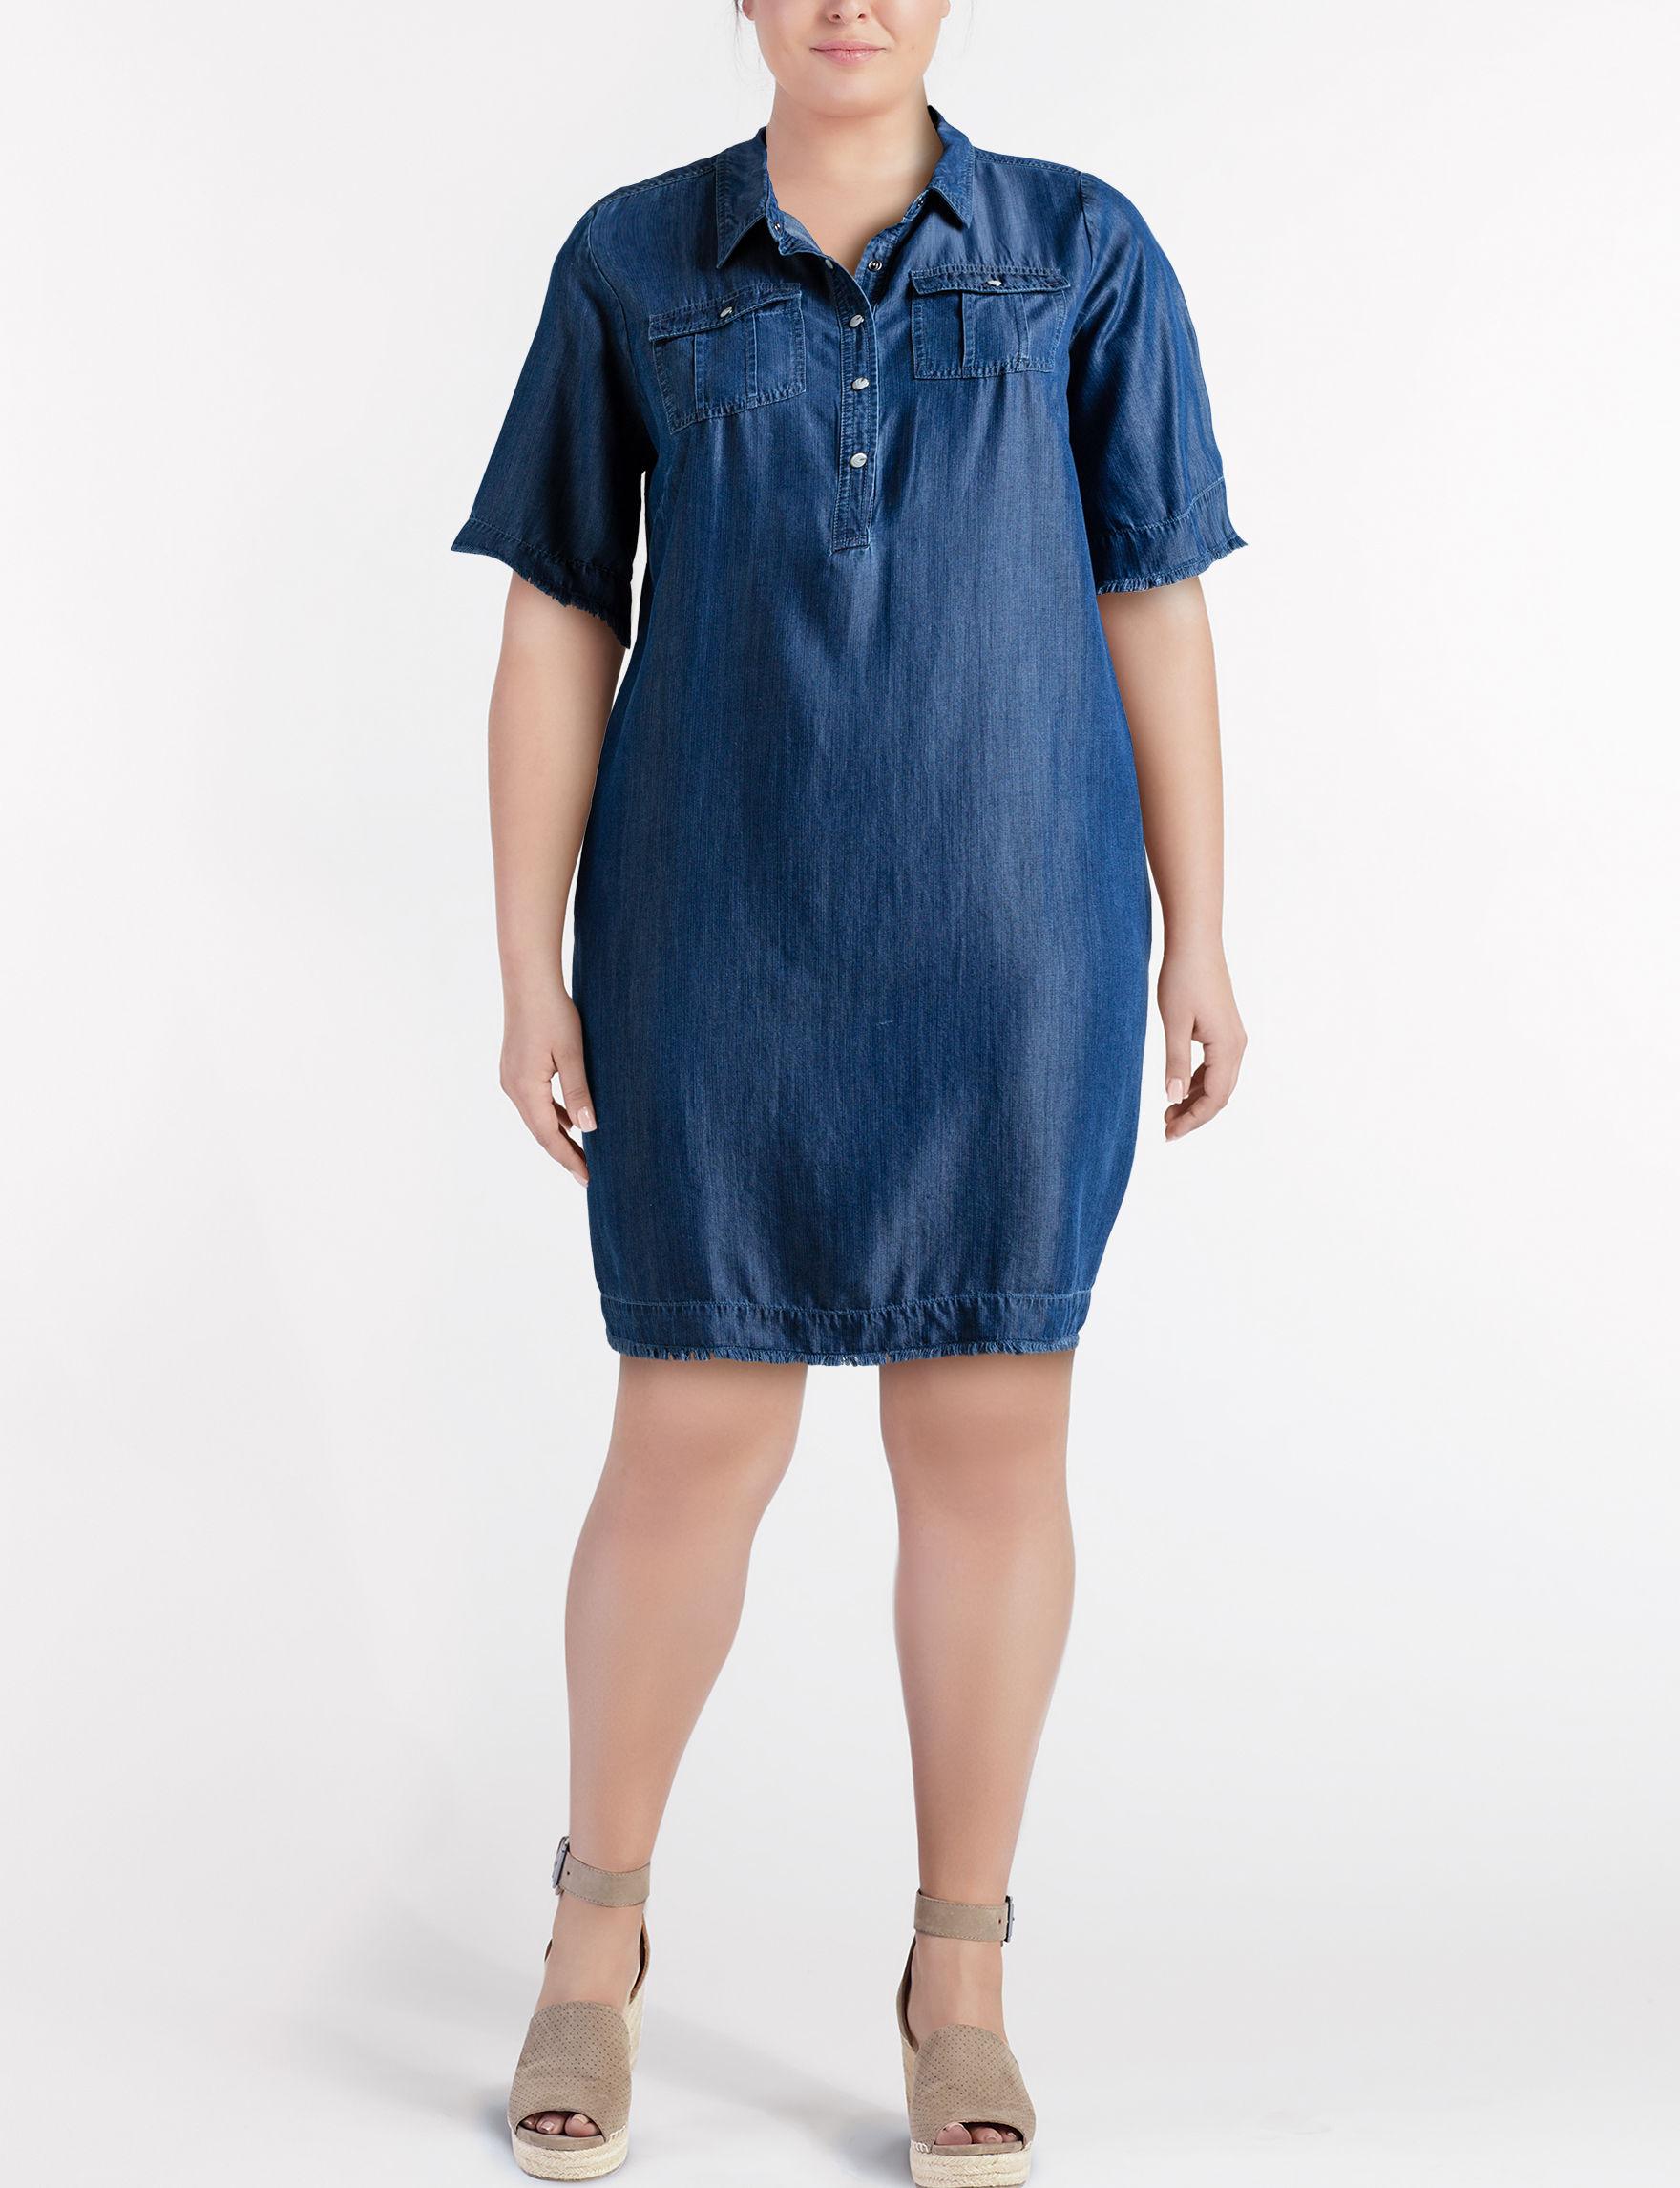 Glamour Denim Everyday & Casual Shirt Dresses